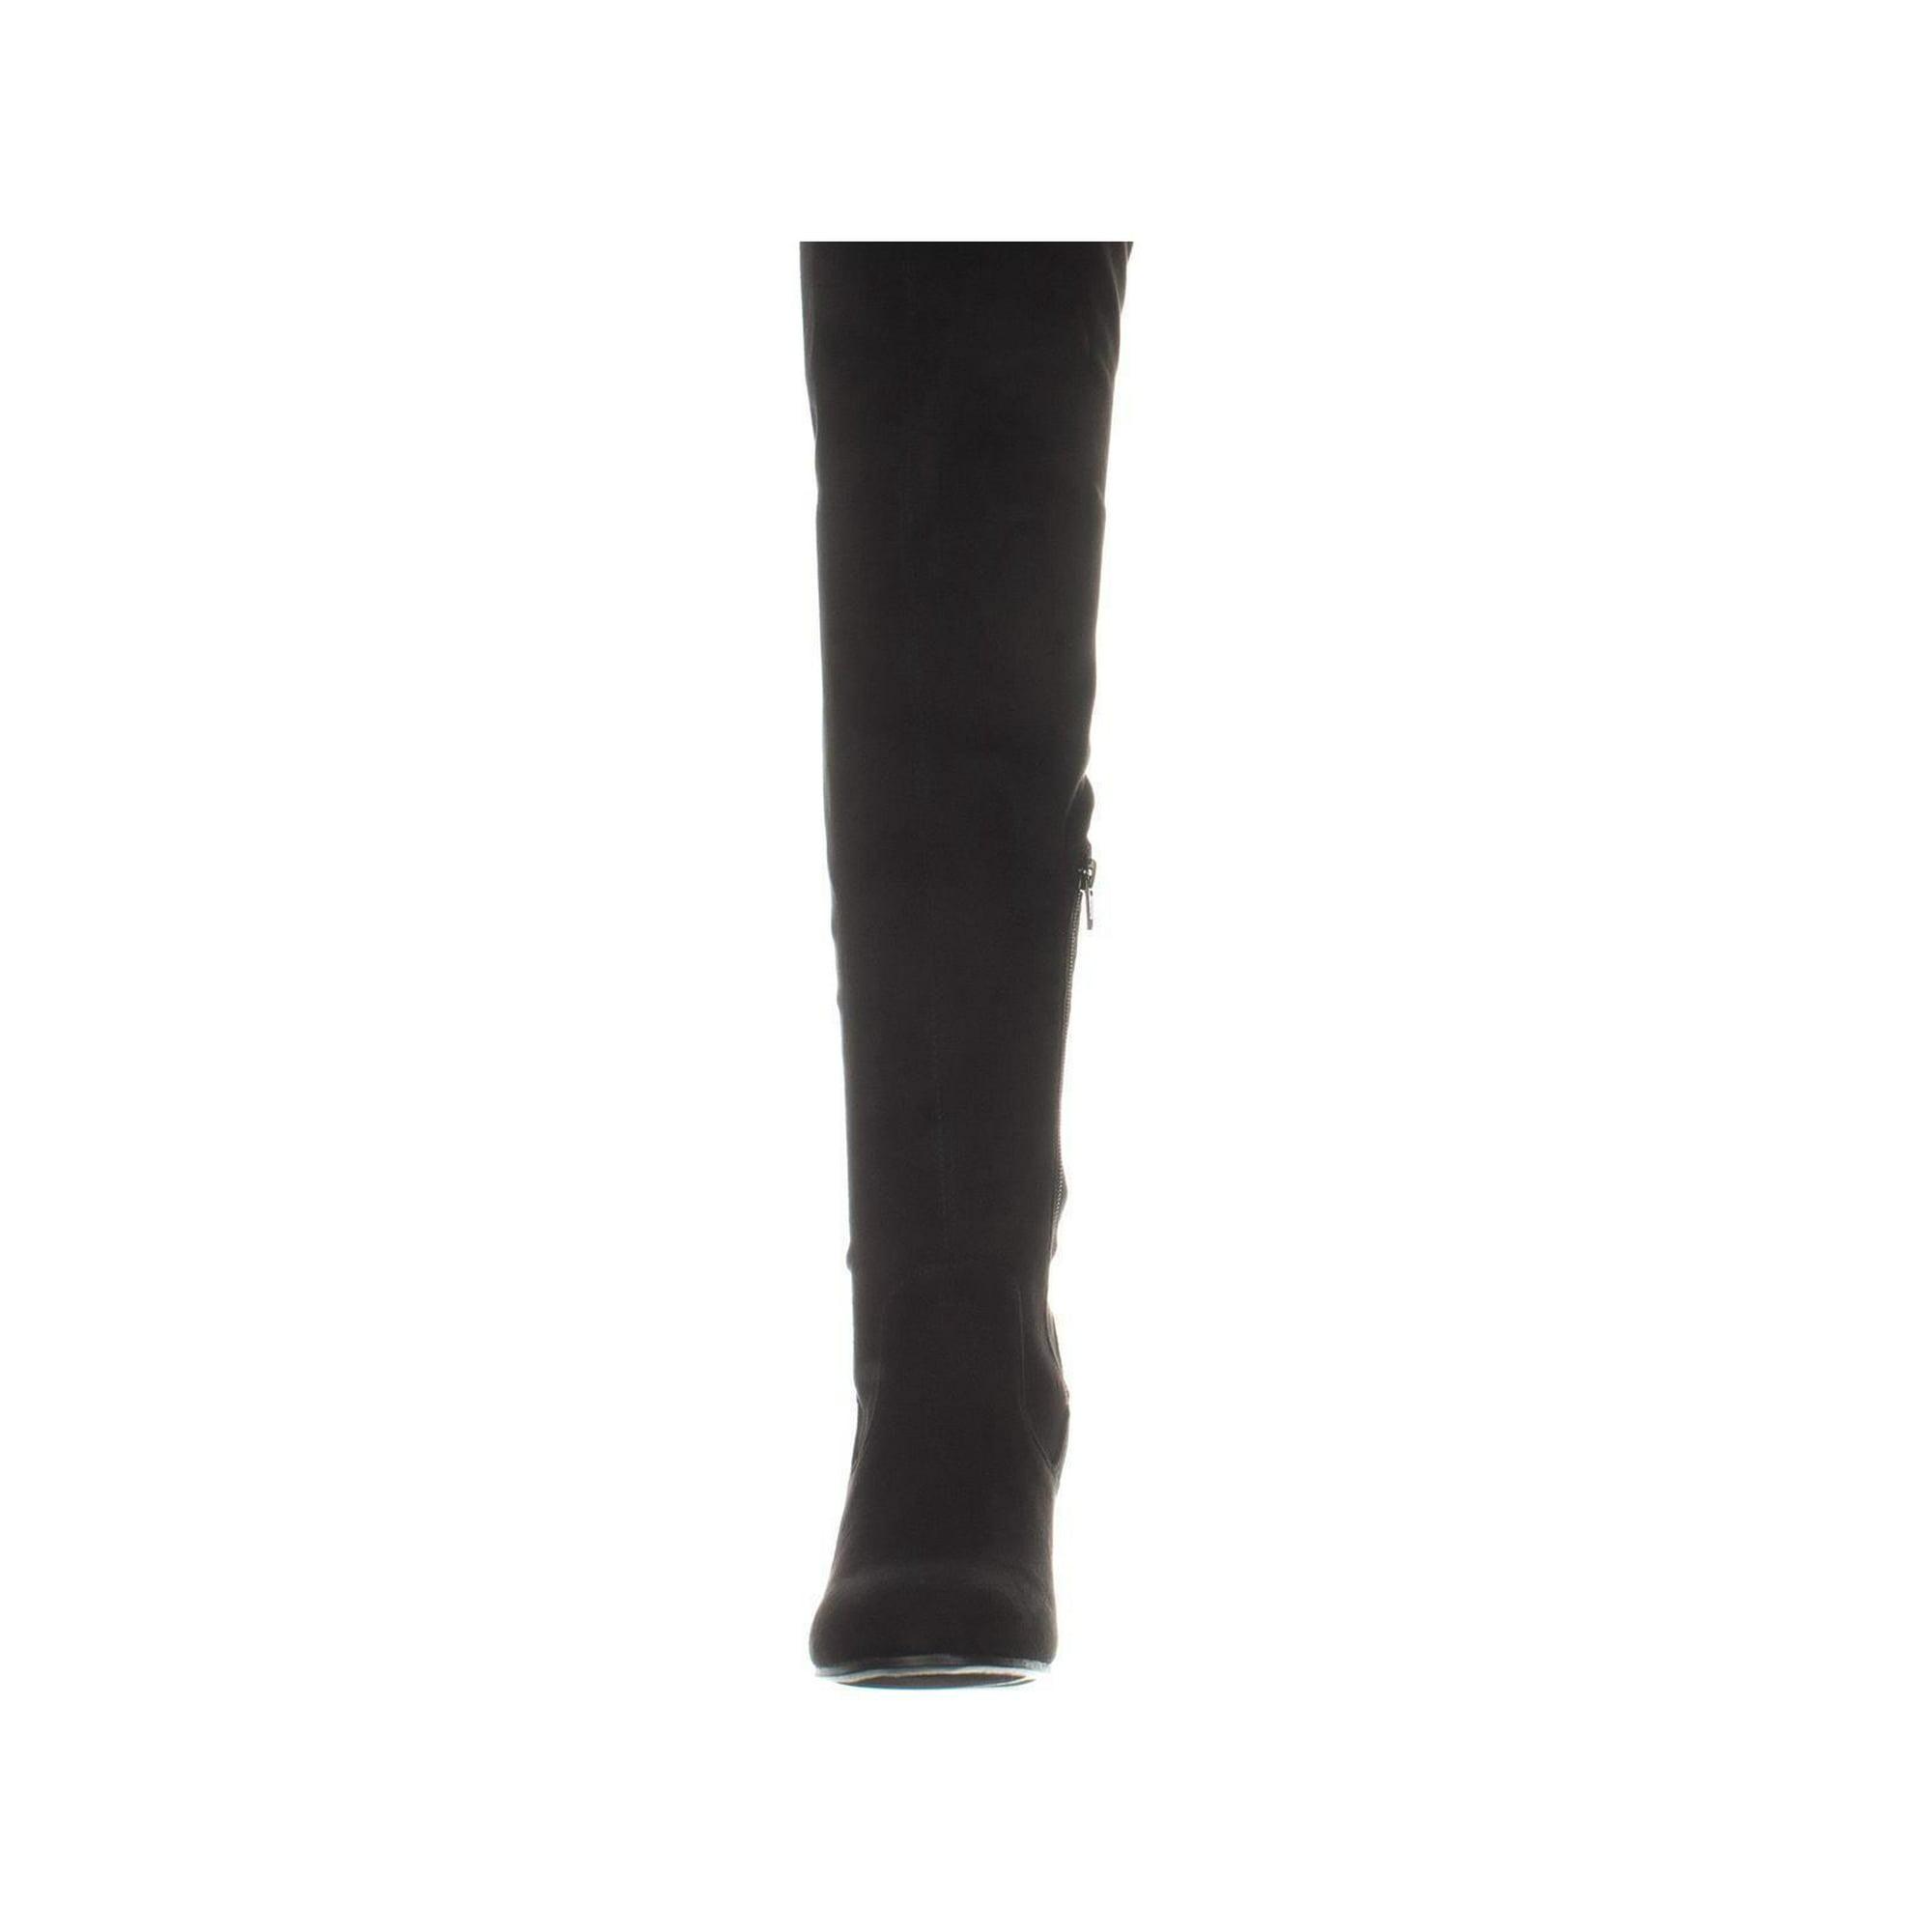 76e4ddffec0 Carlos By Carlos Santana Quantum Wide Calf Over-The-Knee Boots ...